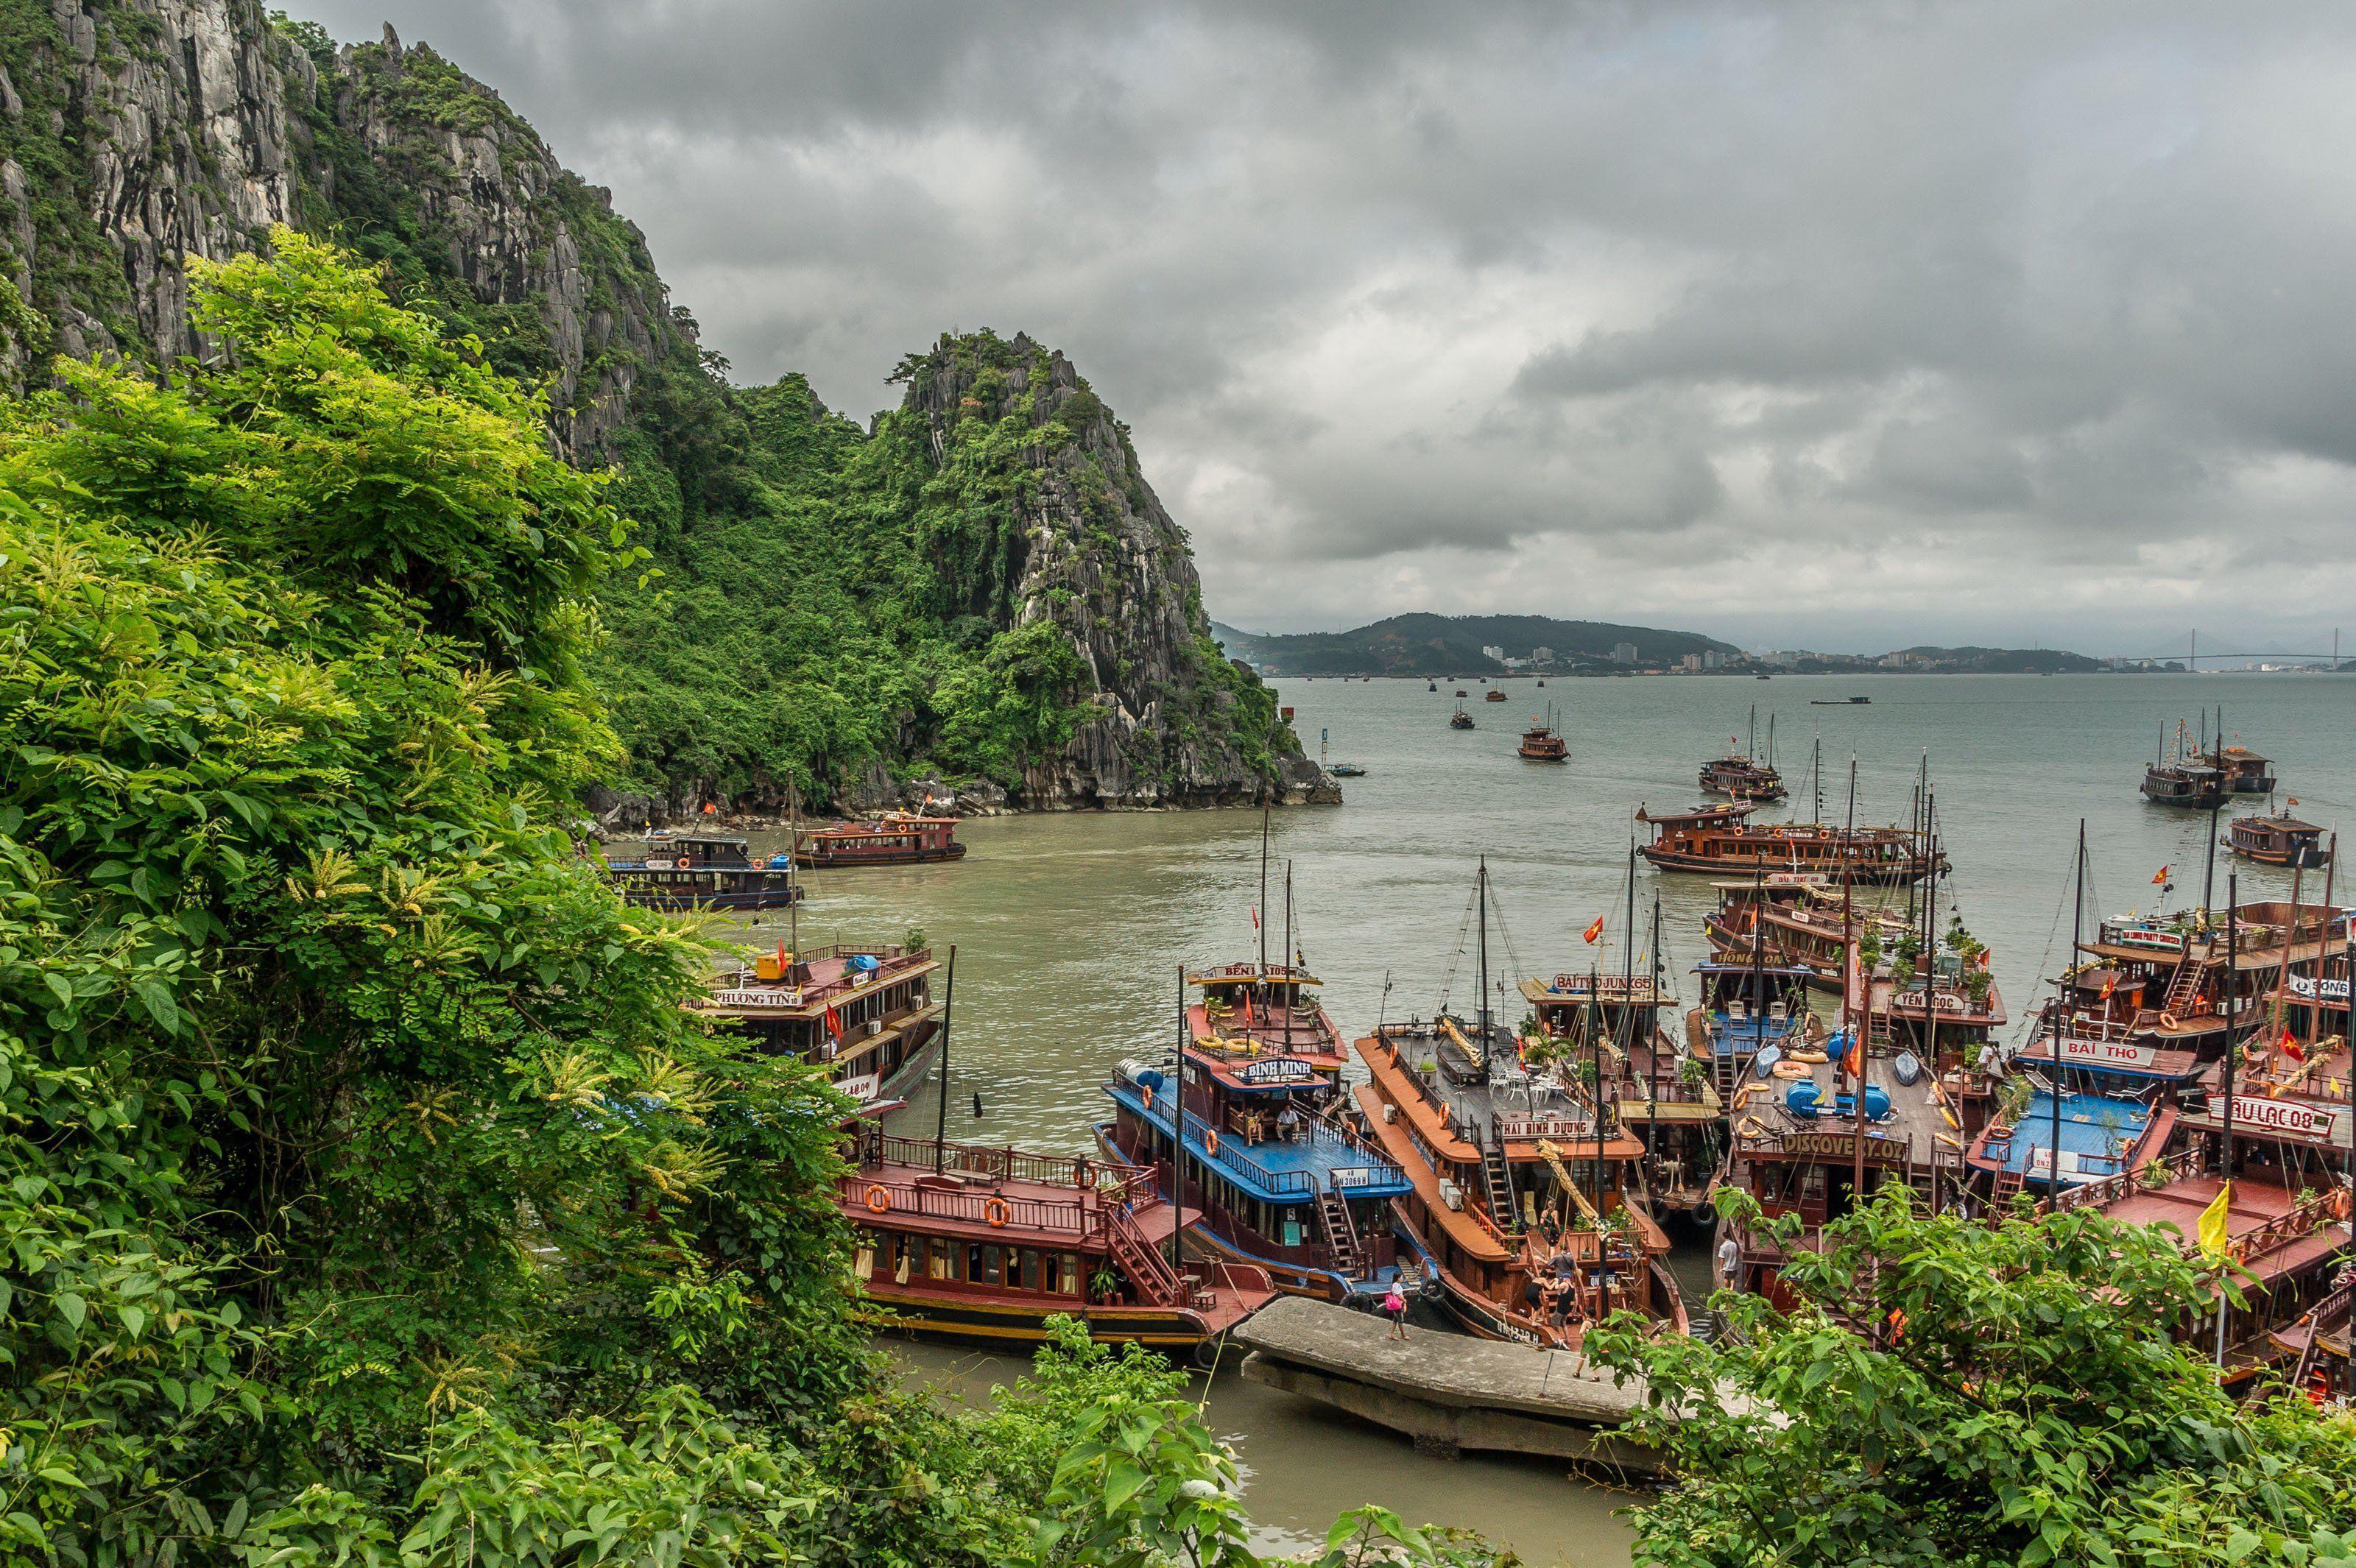 halong bay vietnam landscape free desktop backgrounds and wallpapers